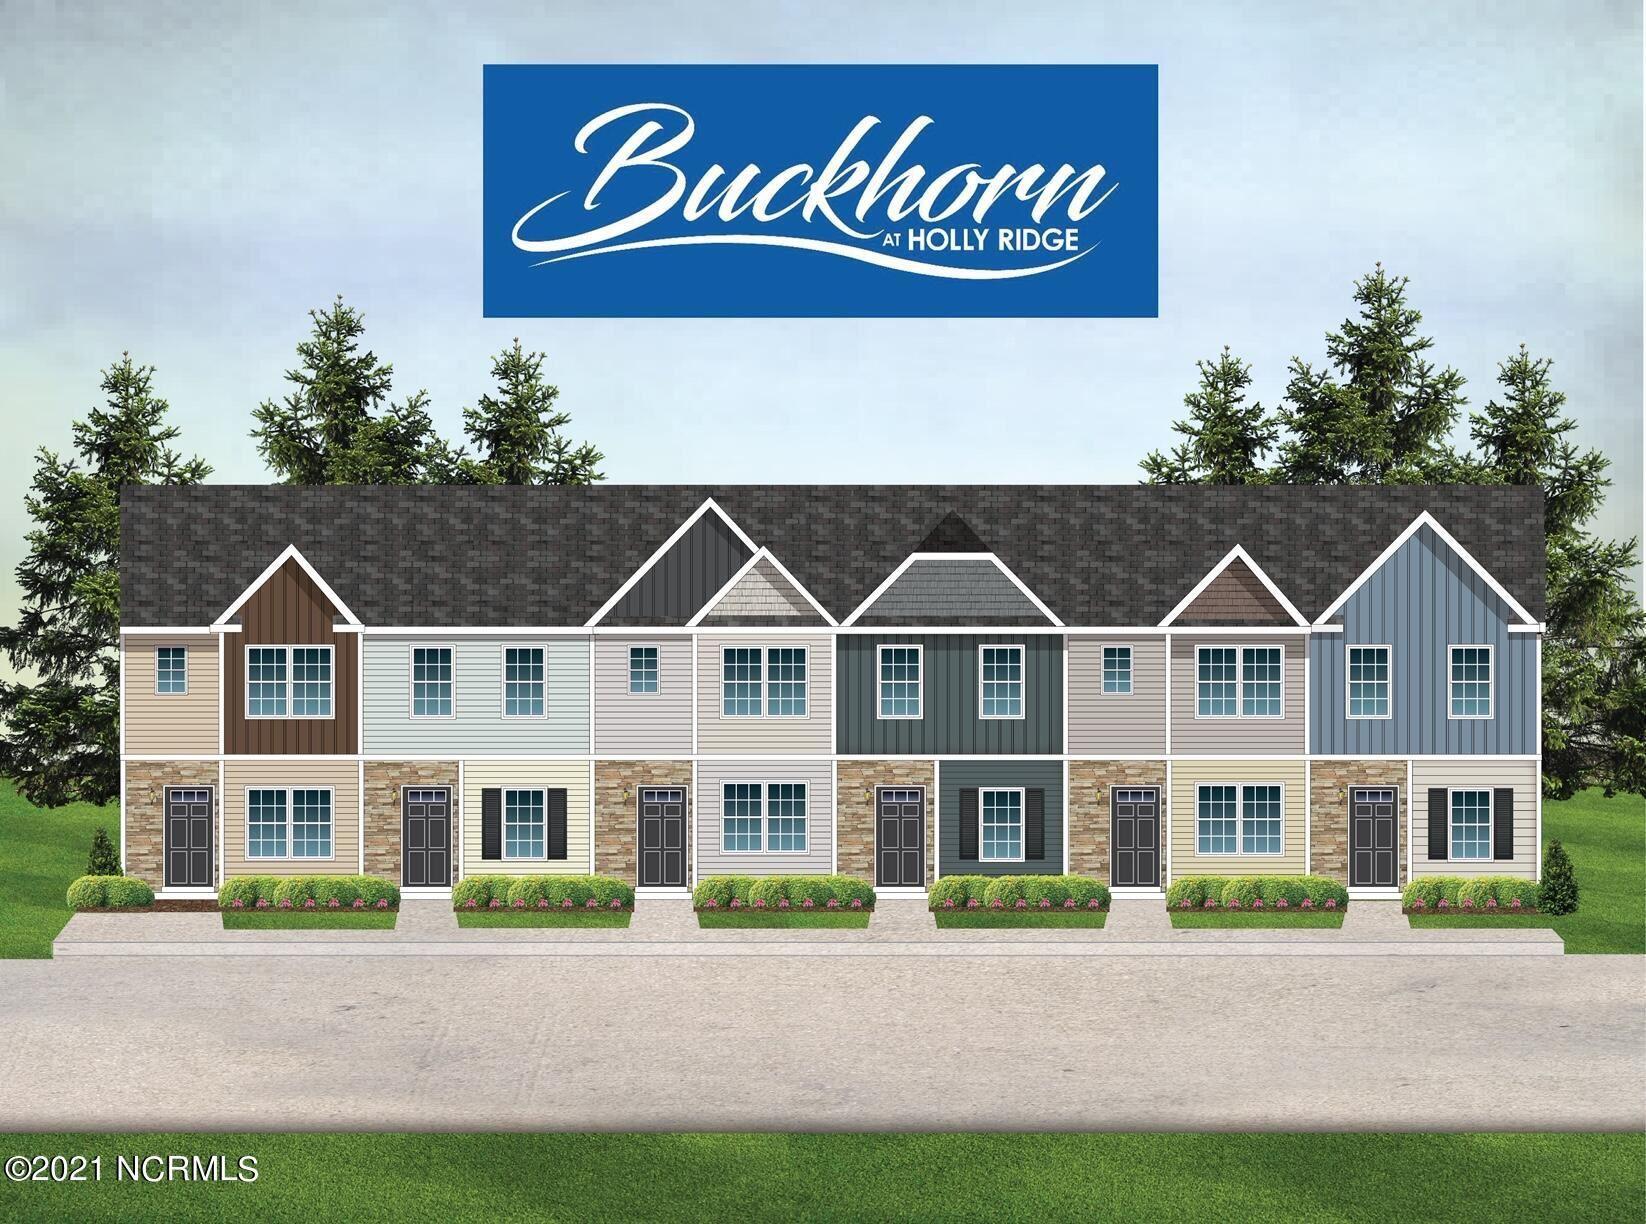 Photo of 204 Buckhorn Ave., Holly Ridge, NC 28445 (MLS # 100294386)